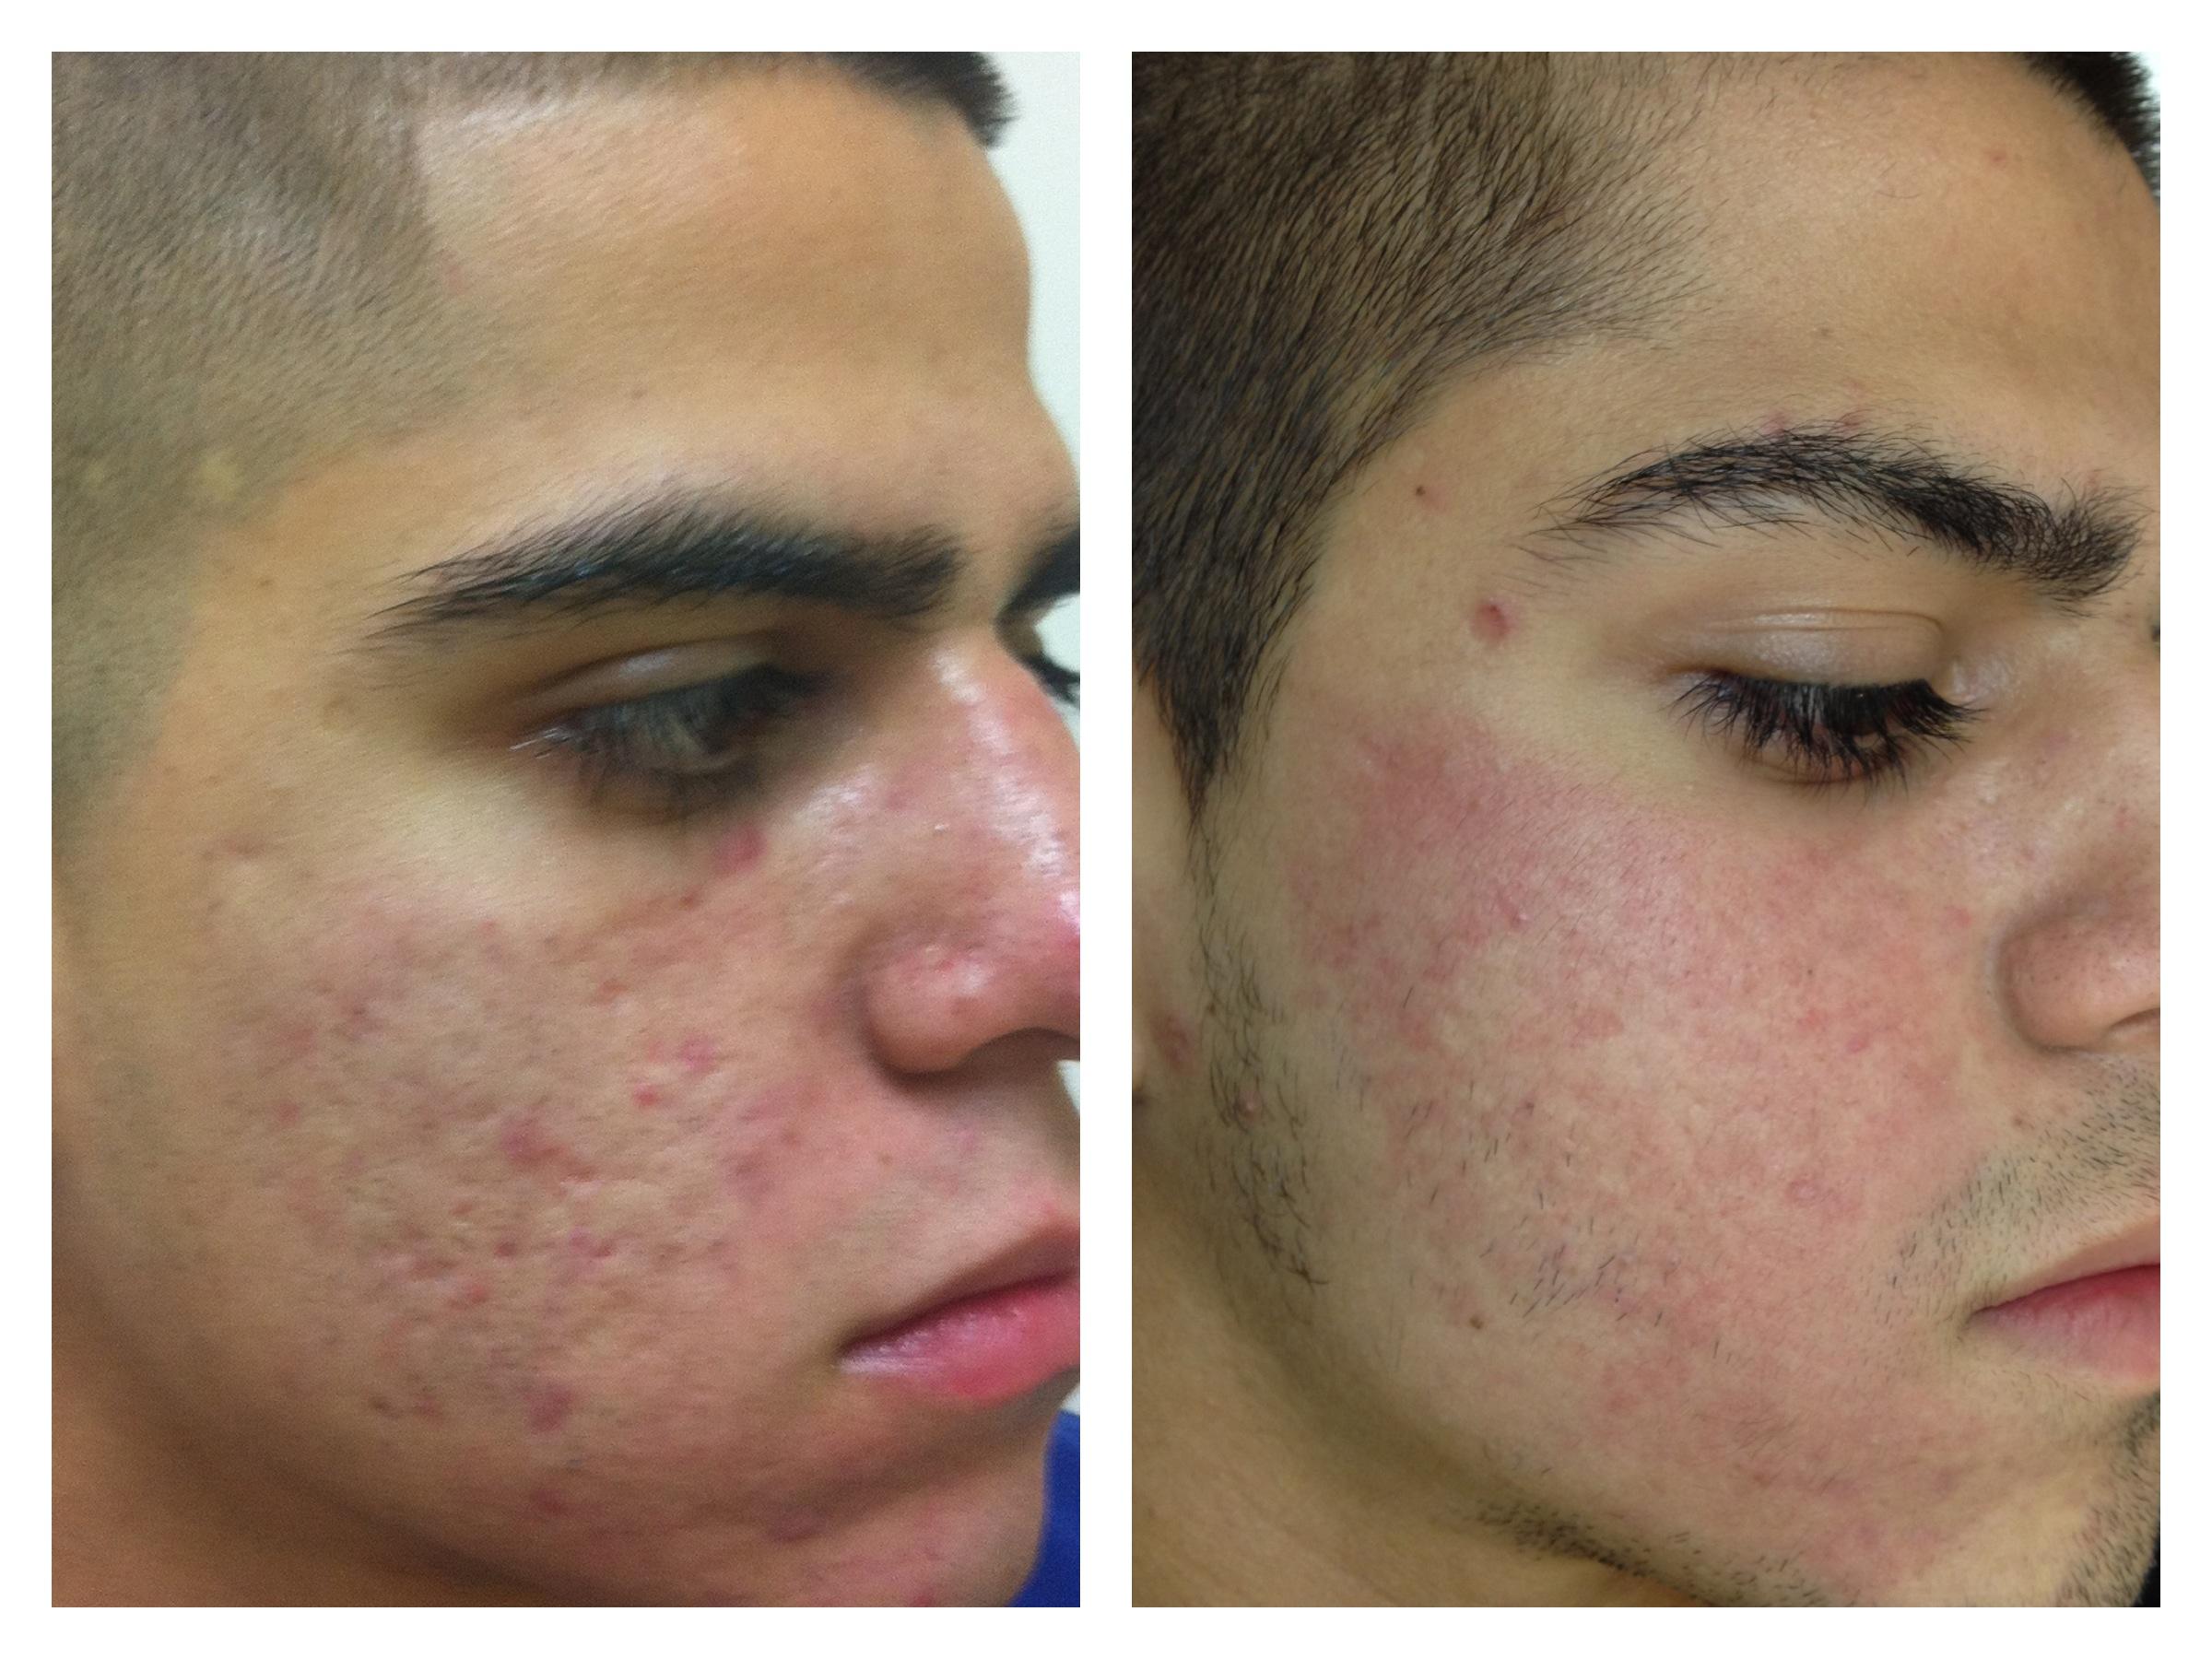 Co2 laser facial resurfacing